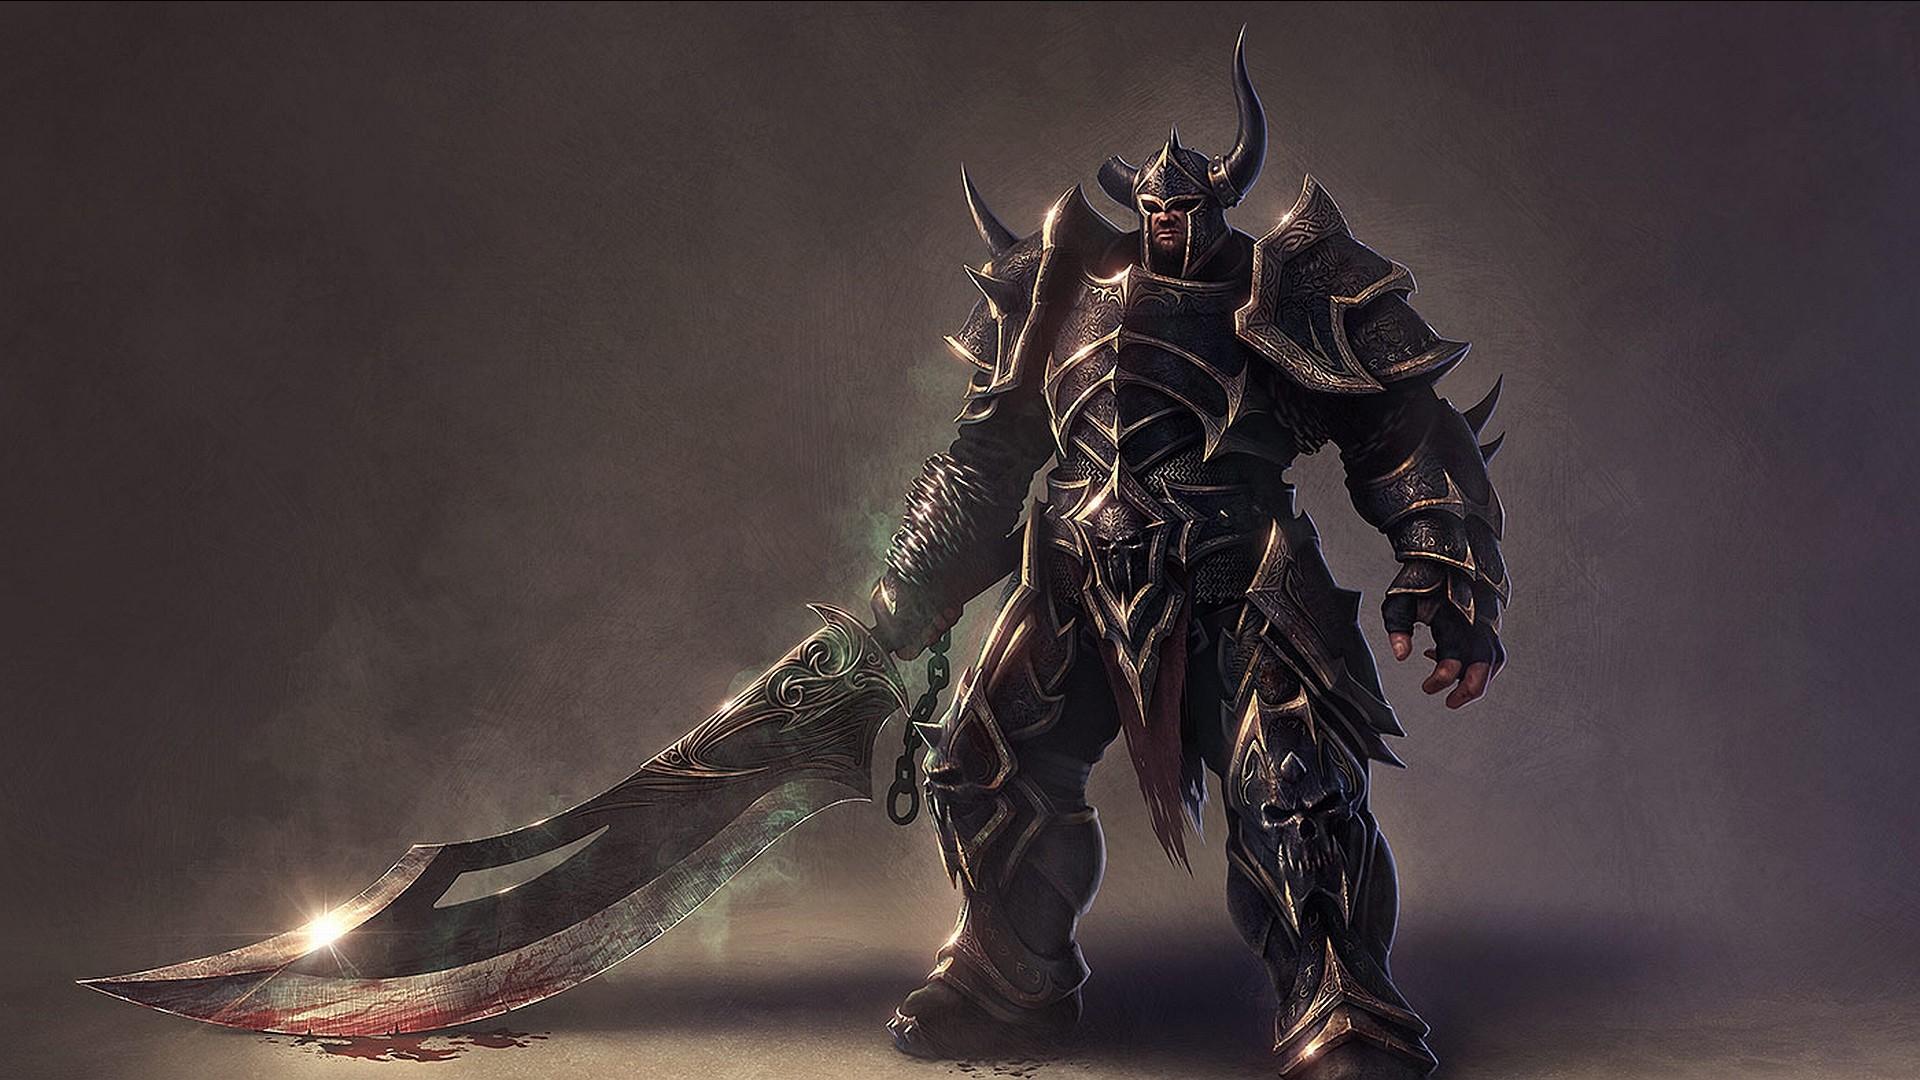 Viking Warrior Concept Art   Alpha Coders   Wallpaper Abyss Fantasy Warrior  176408